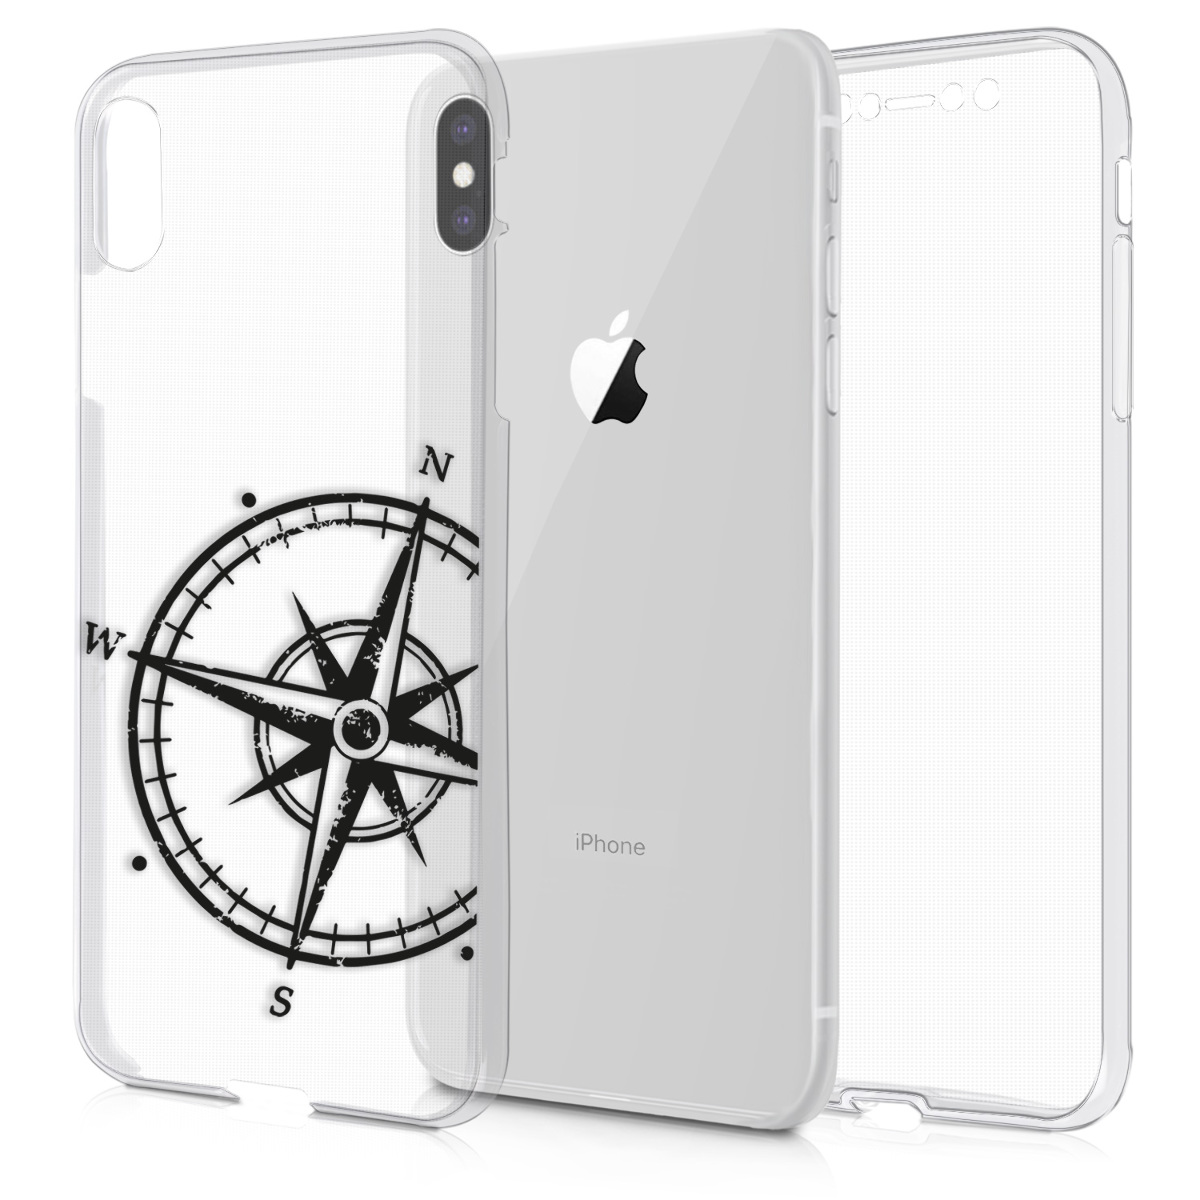 KW Διάφανη Θήκη Σιλικόνης Full Body iPhone XS Max - Μαύρη Πυξίδα (46732.01)